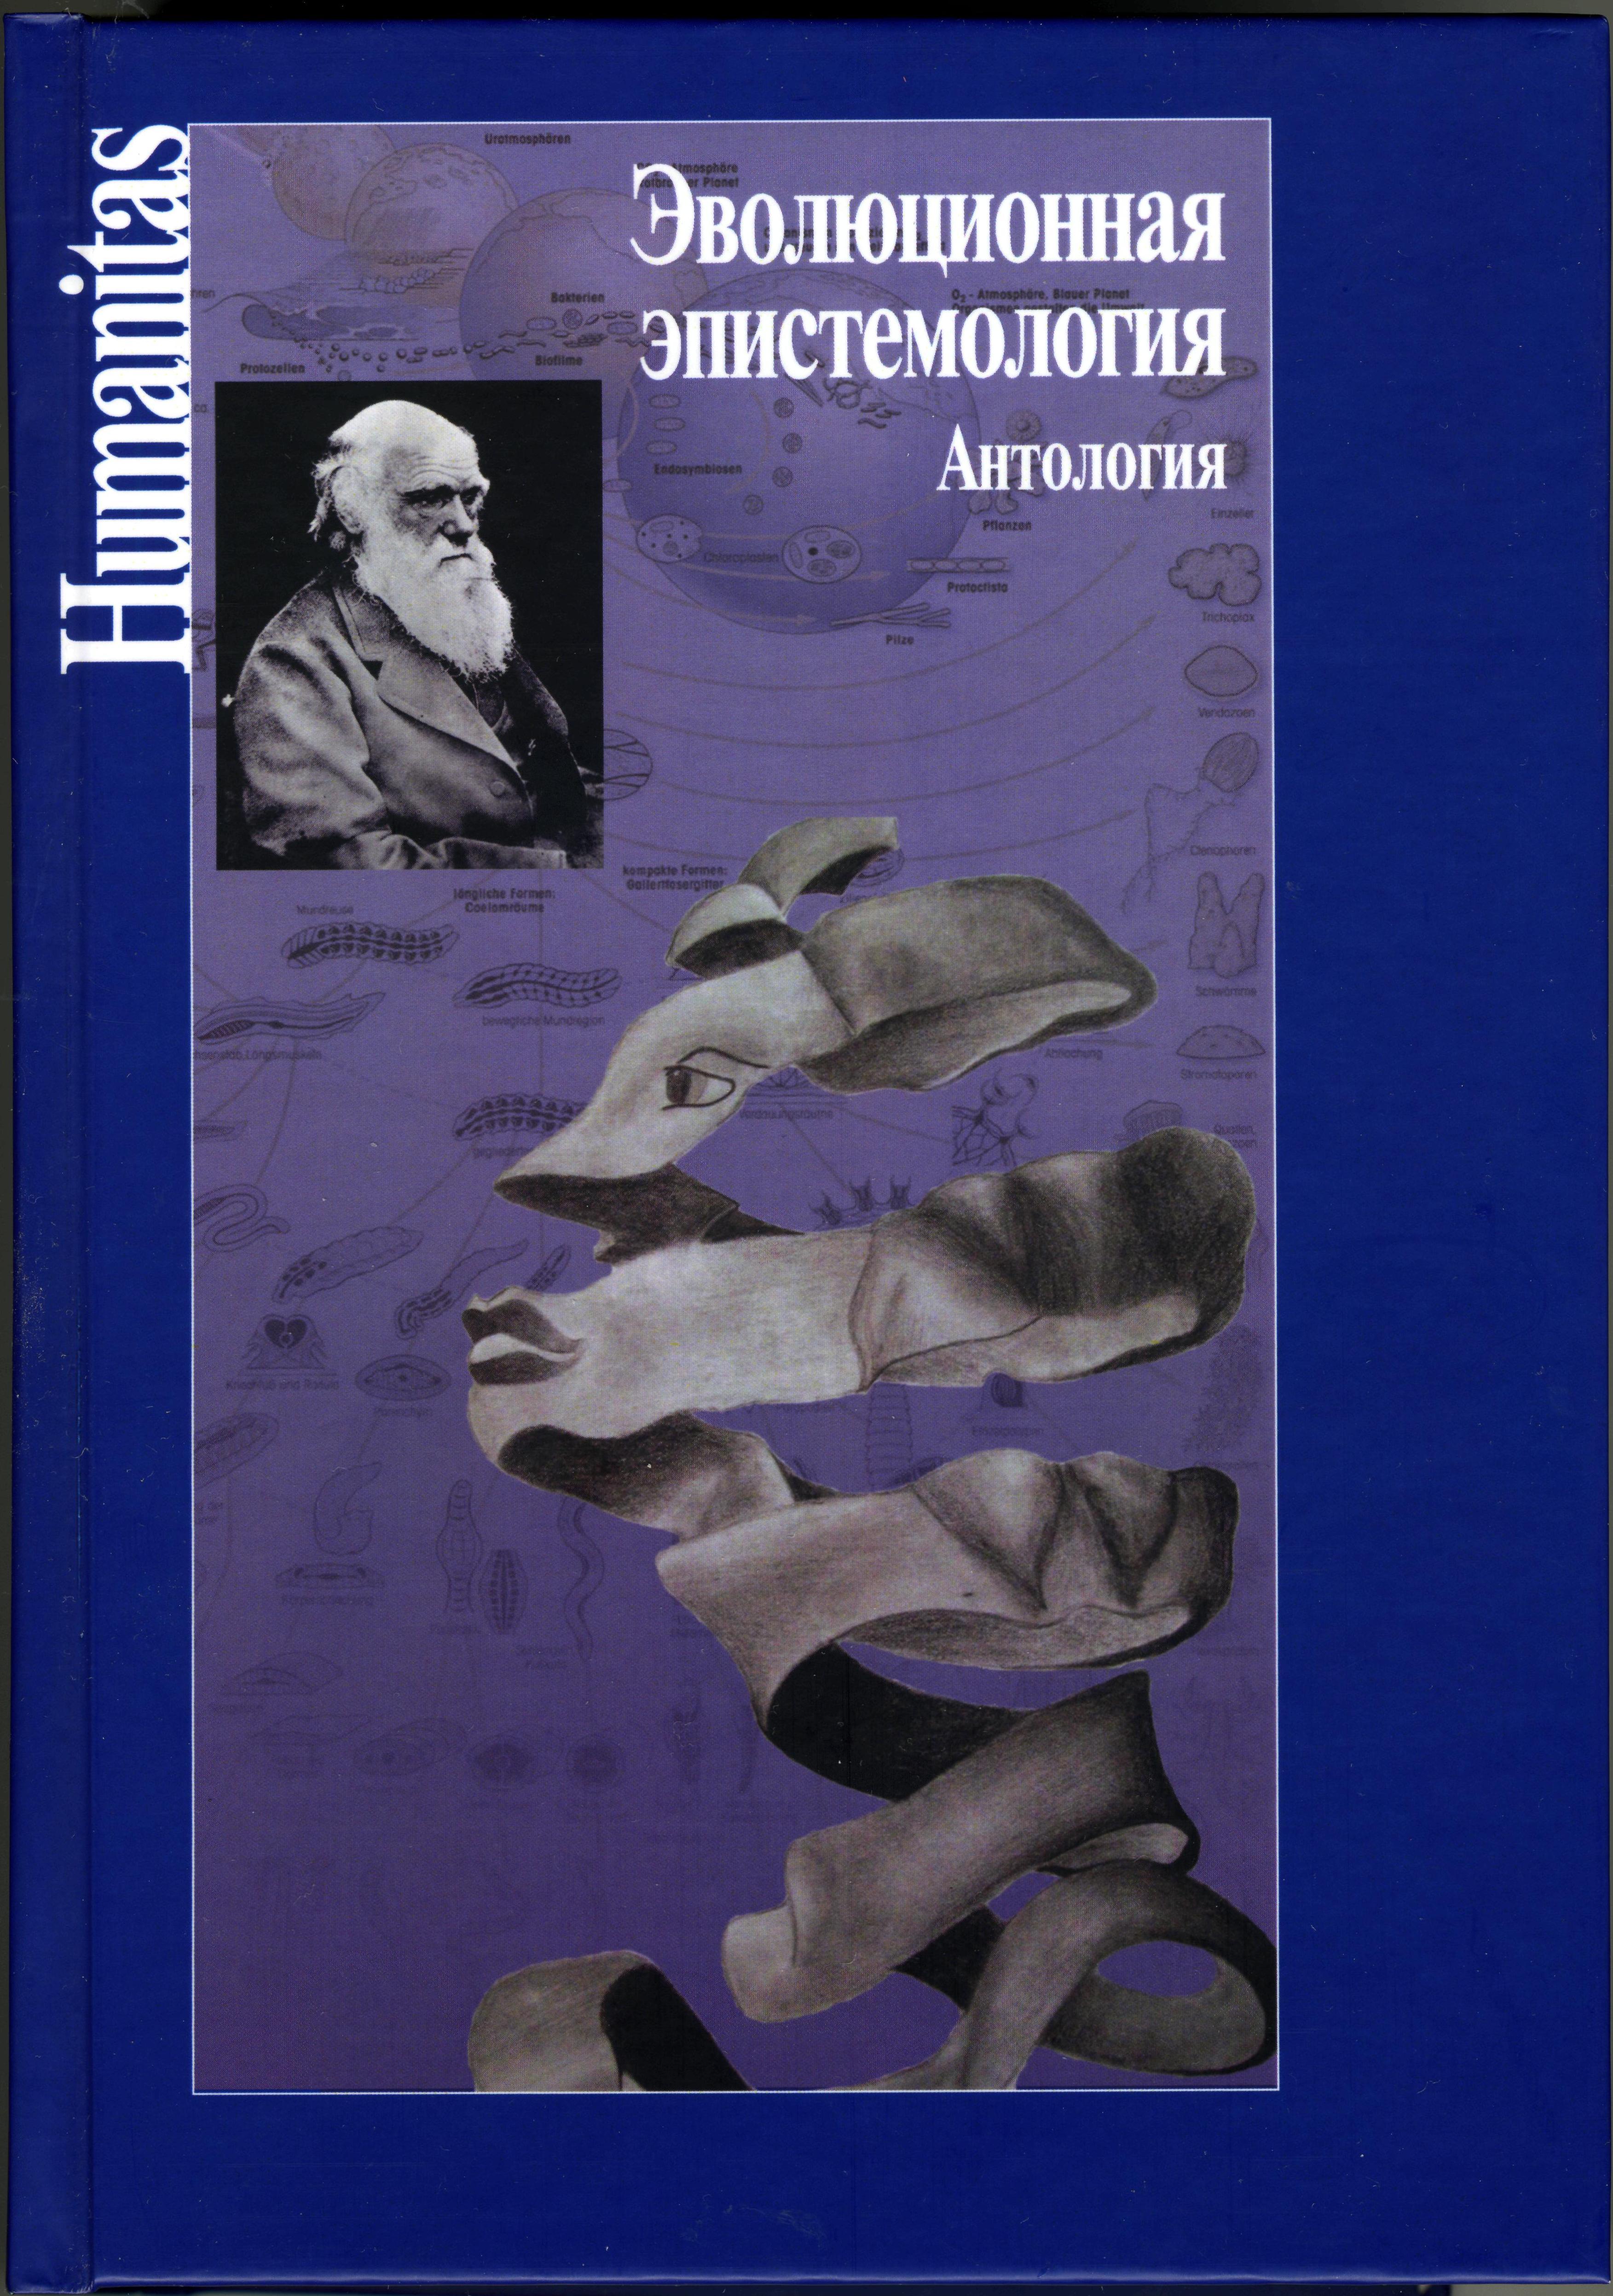 Эволюционная эпистемология. Антология